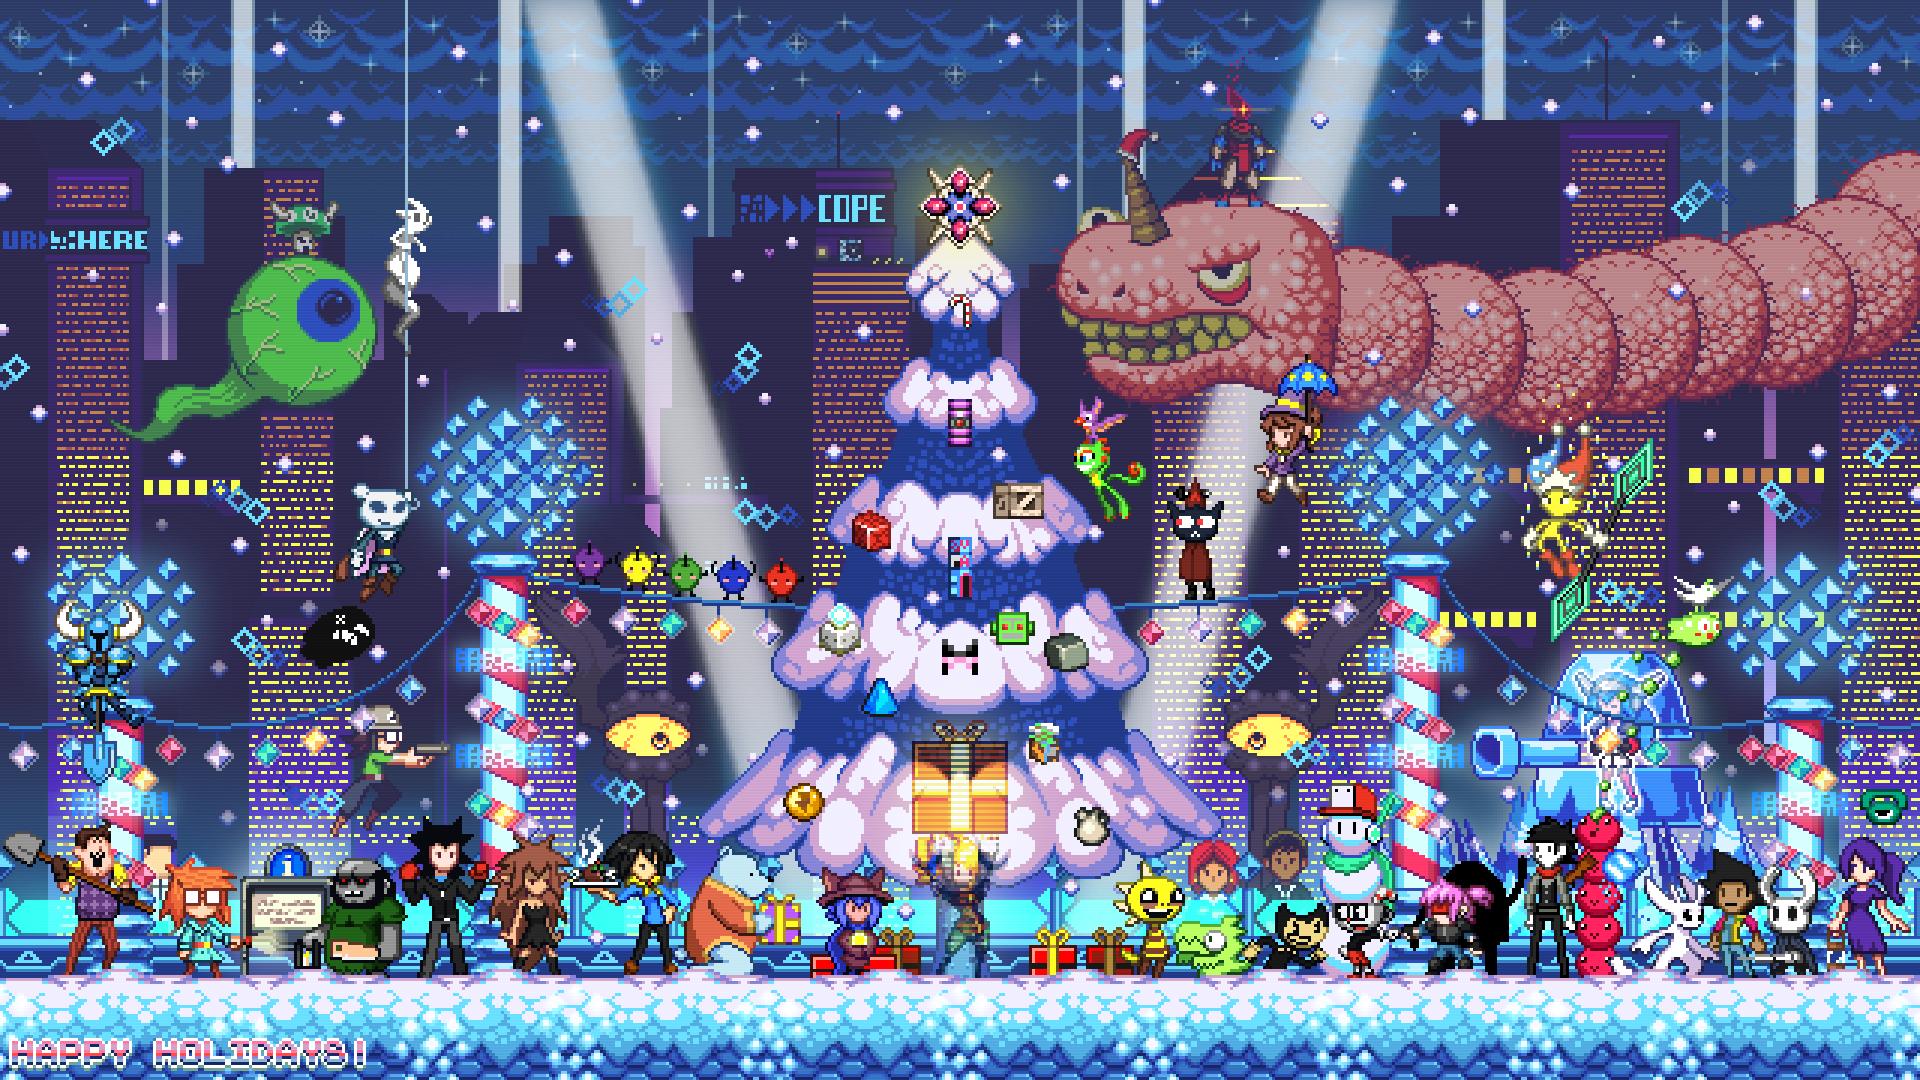 Indie Games Holidays wallpaper